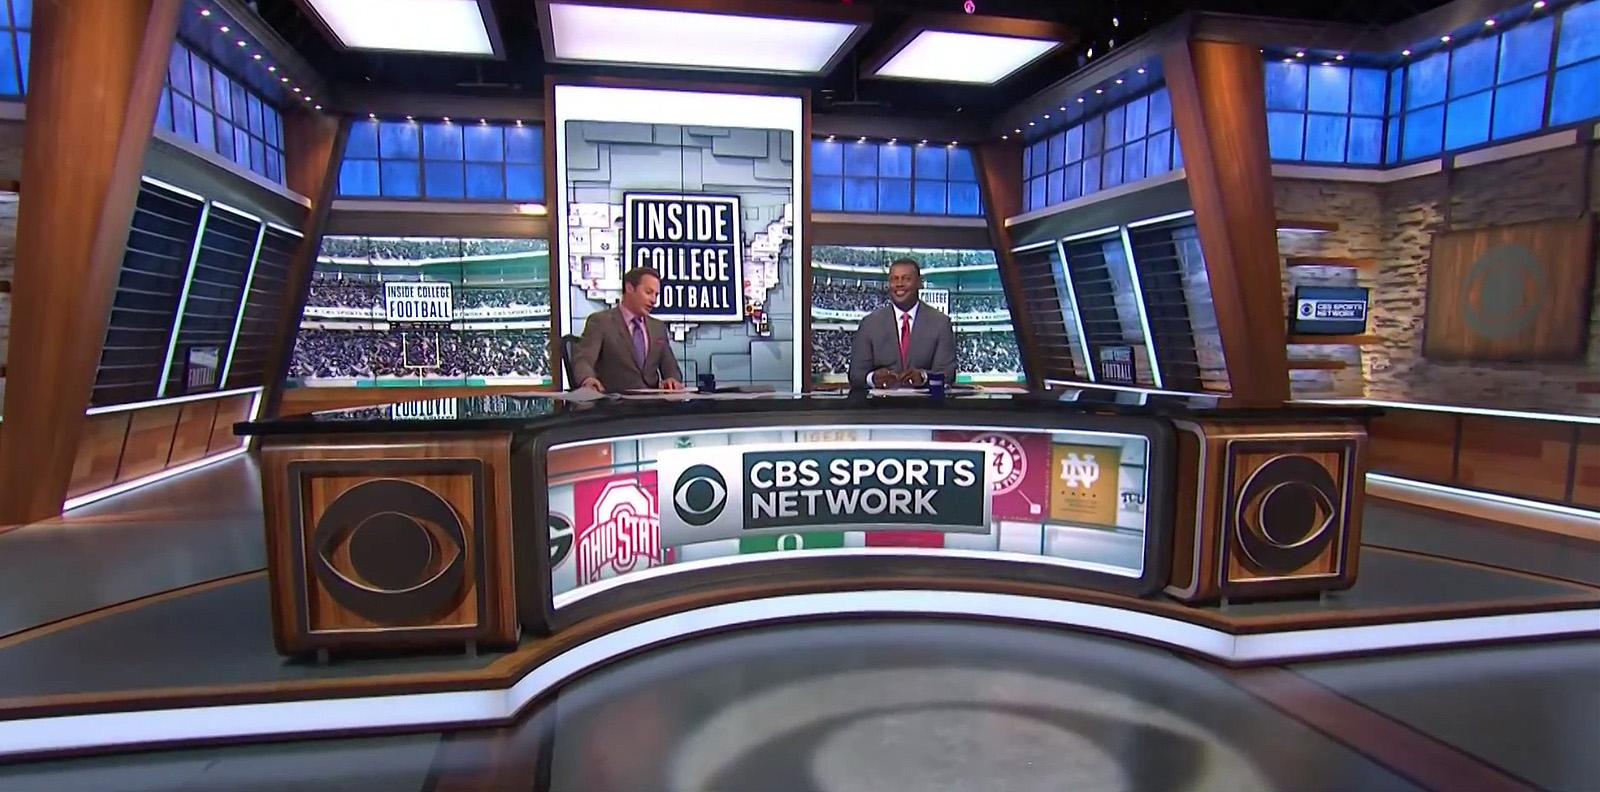 NCS_CBS-Sports-Network-Studio-2018_0002